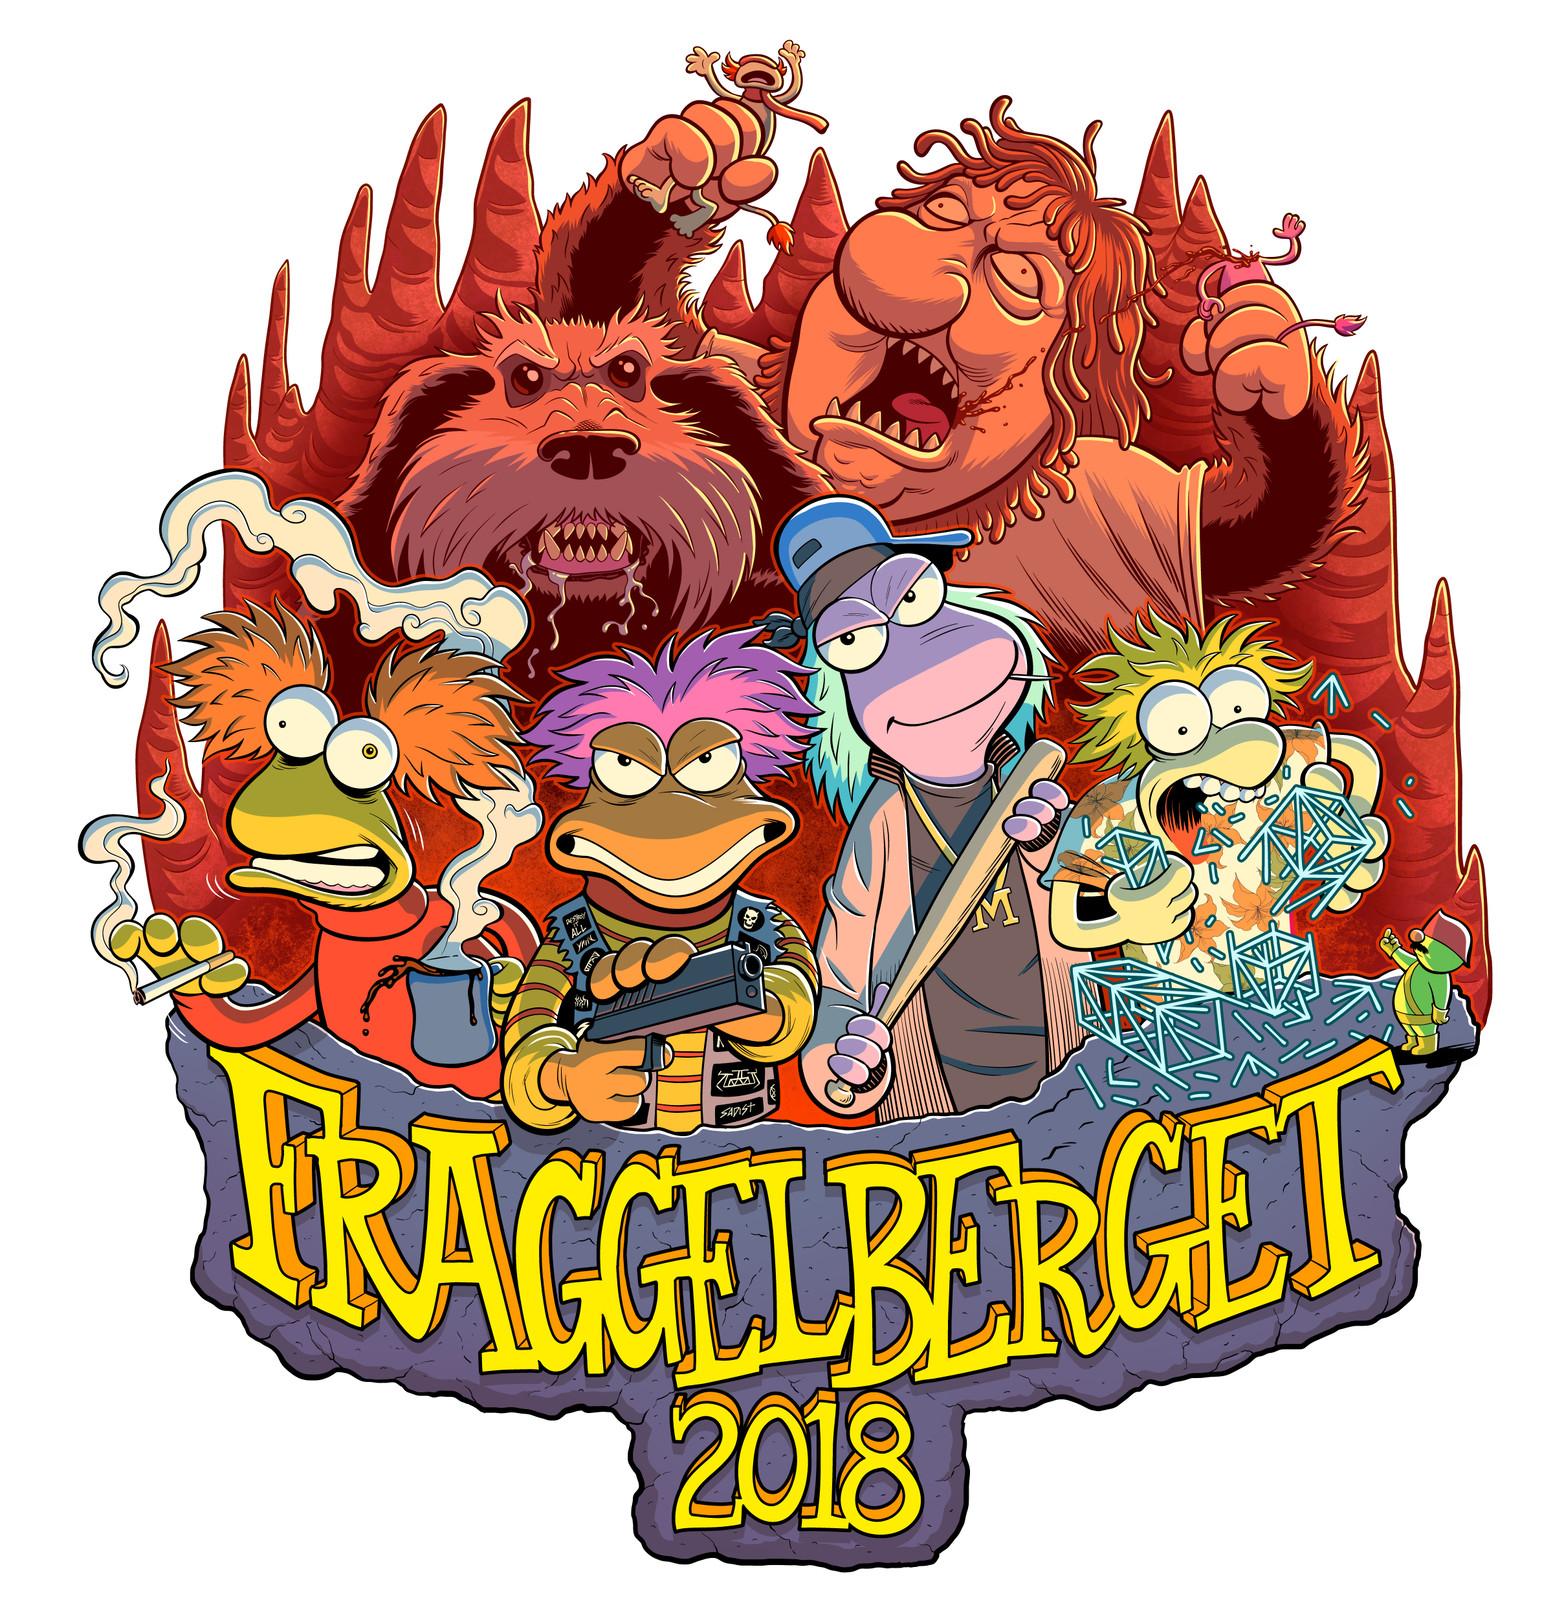 Fraggelberget Russ Logo